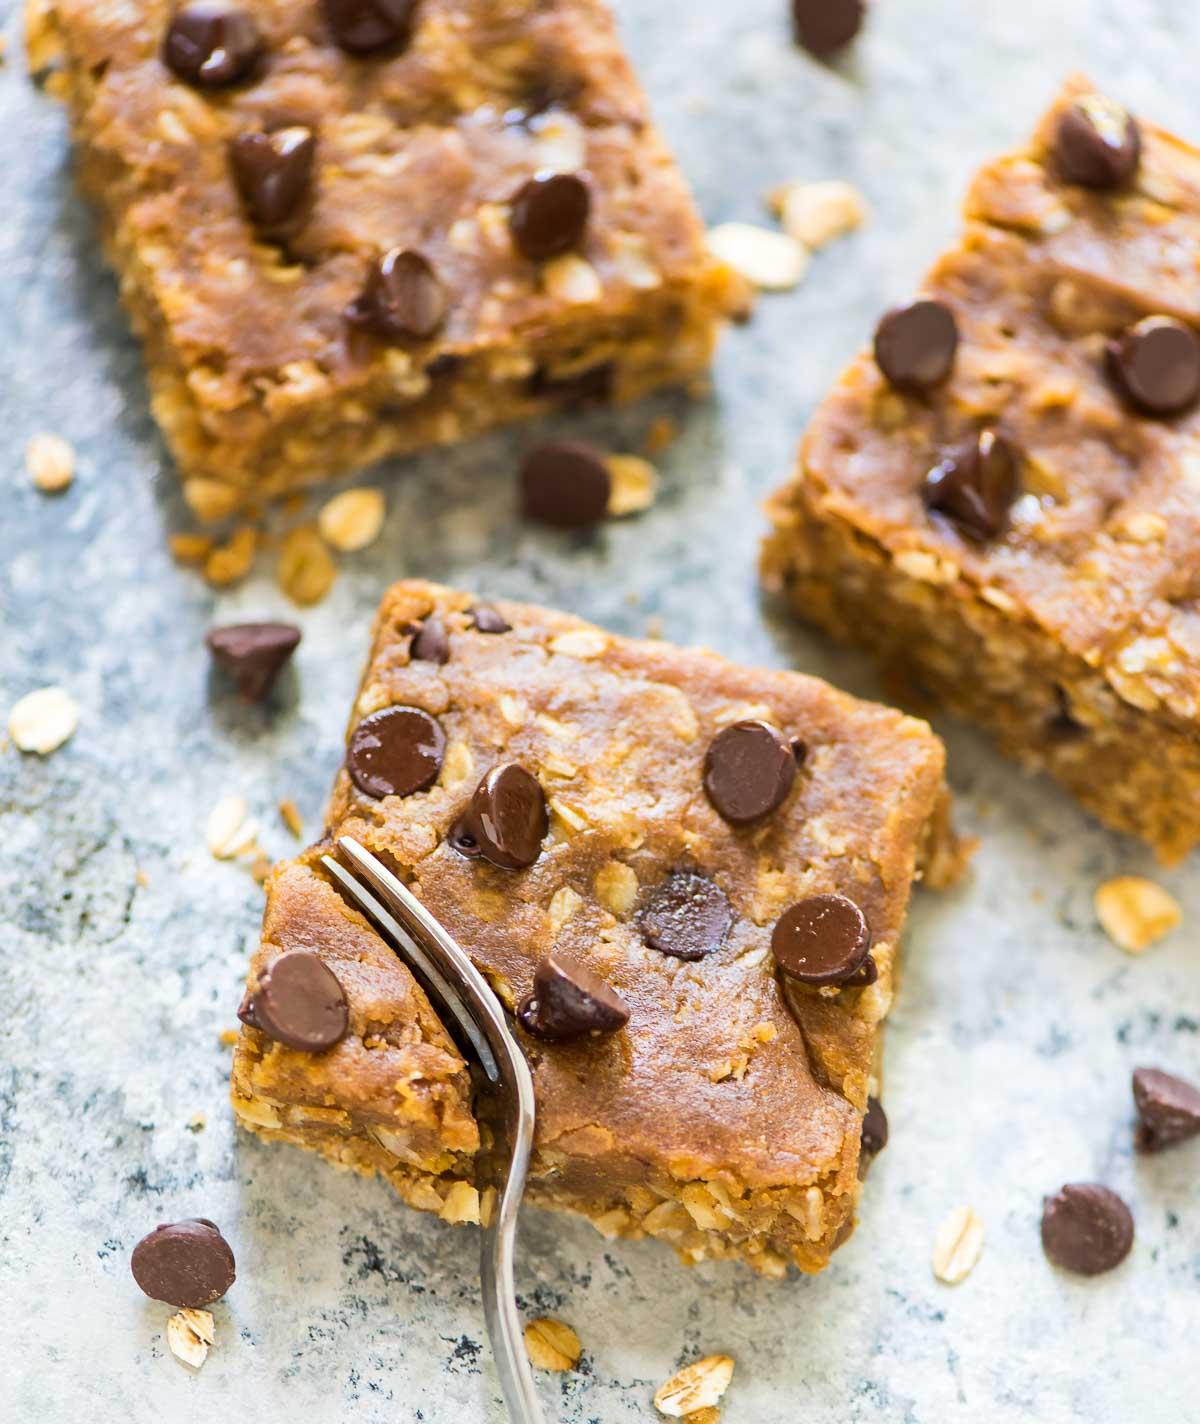 Healthy oatmeal chocolate chip bars - AOL Food